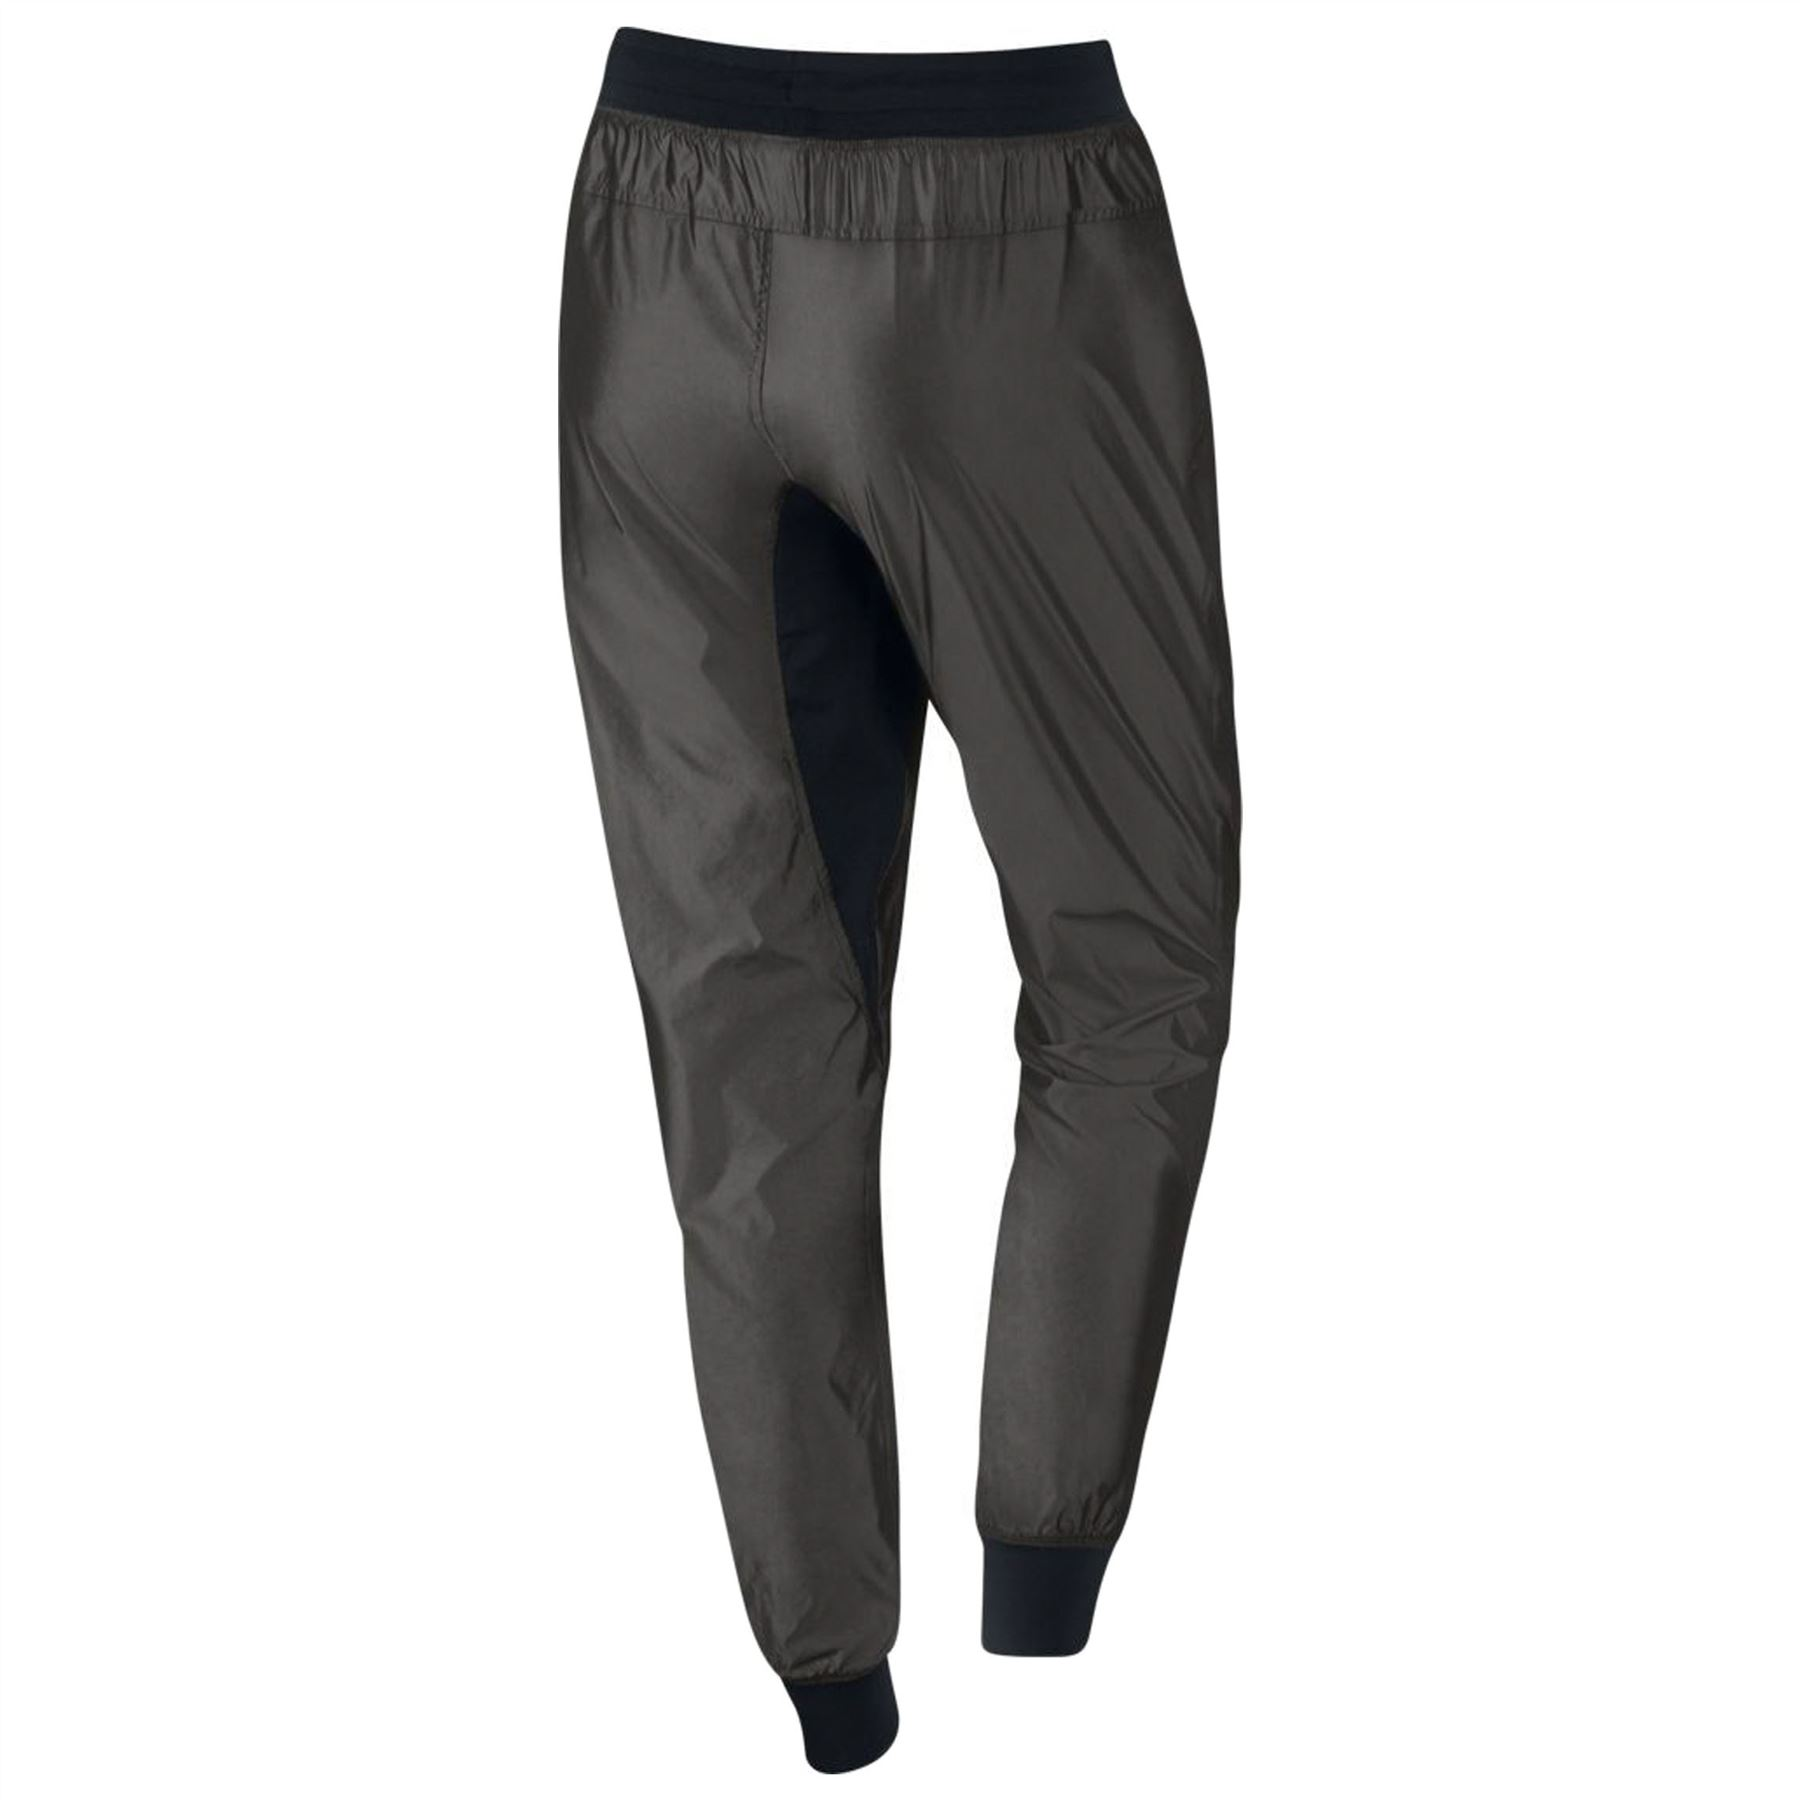 Model Nikecharcoalnikelimitlessmenscuffedsweatpantsproduct24843310